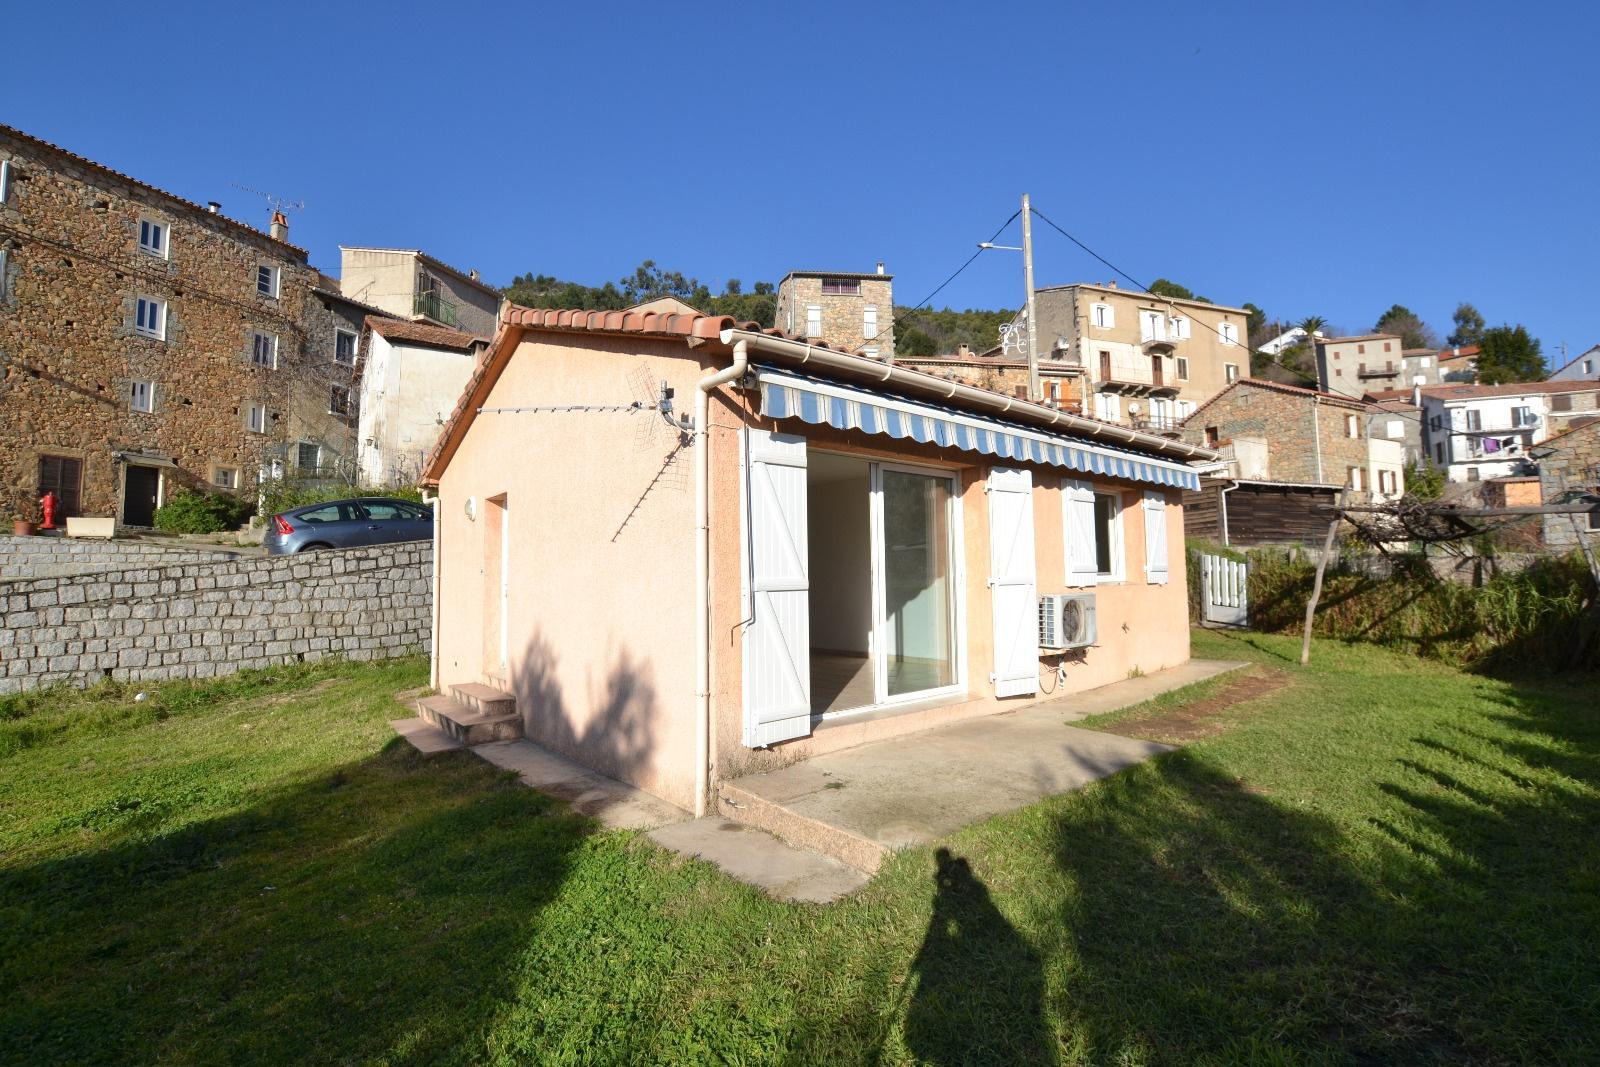 Maison 2 pièces 50 m2 Sarrola-Carcopino